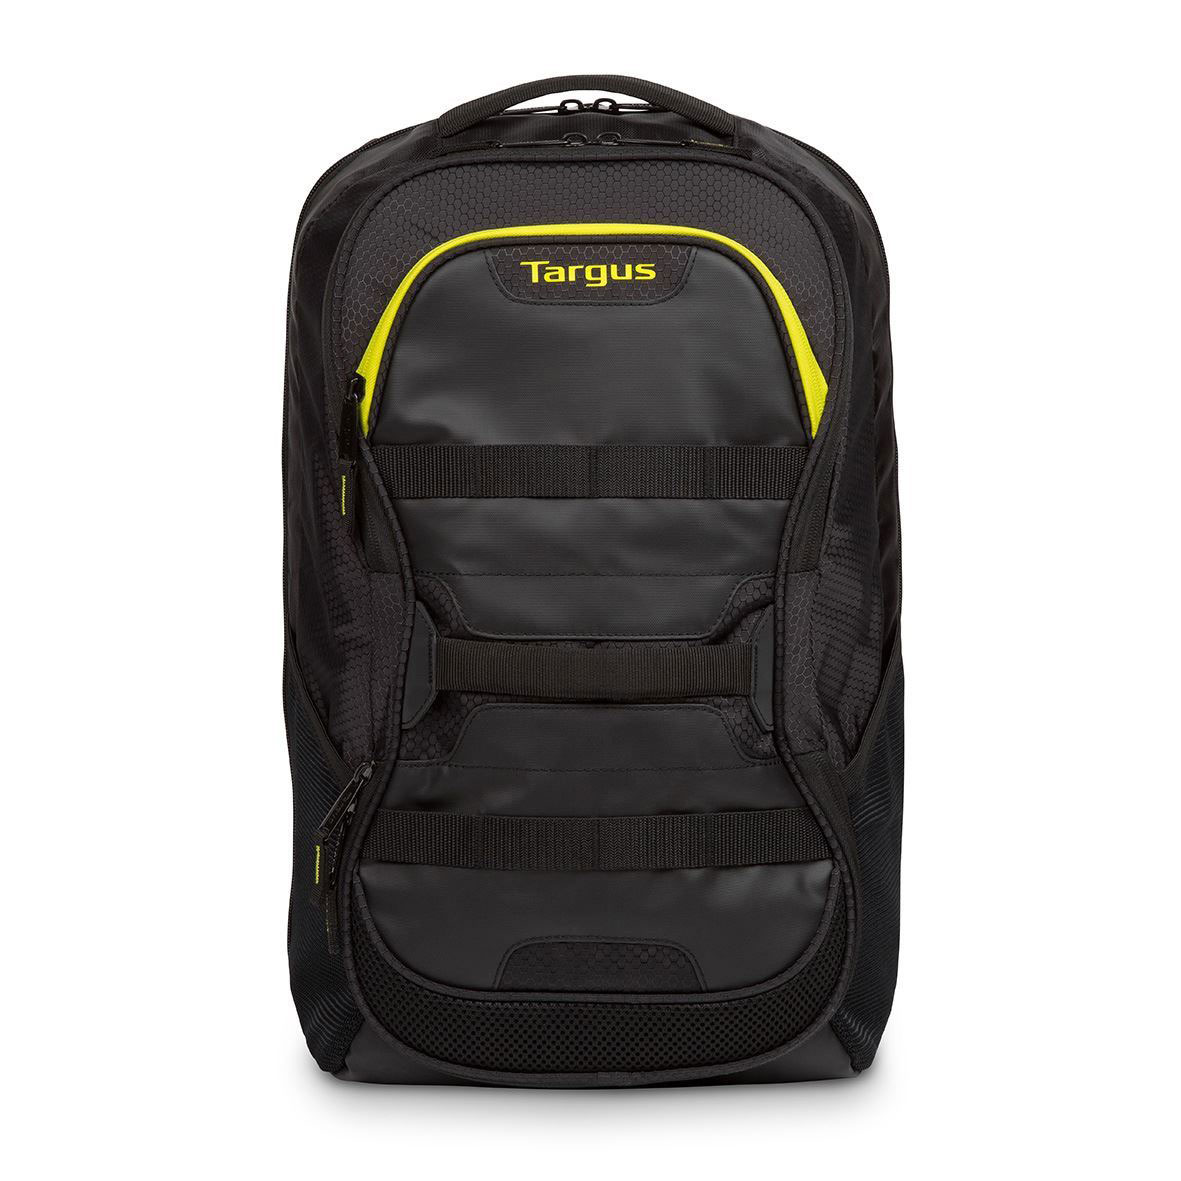 "TSB944EU Stamina 15.6"" Laptop Backpack Targus - Sac et sacoche - 7"